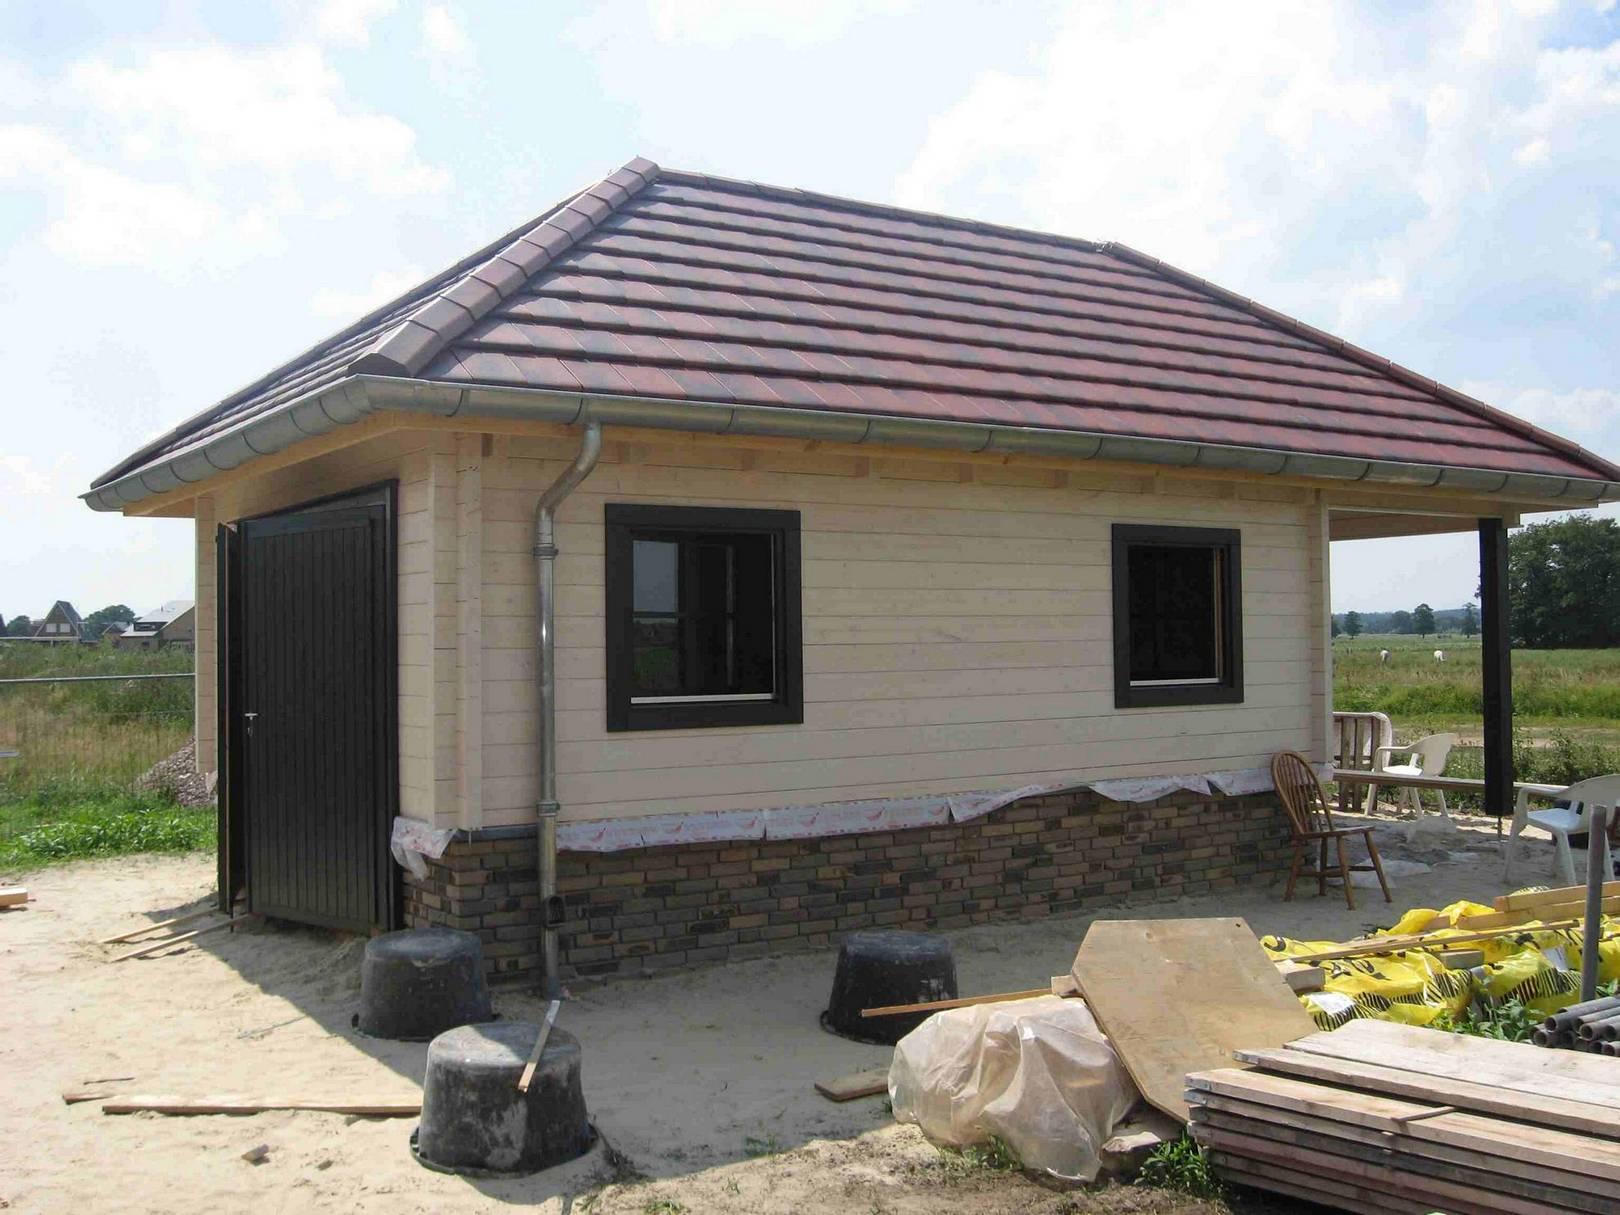 Garage modern holz  Holzgarage nach Maß - Holzgaragen nach Maß